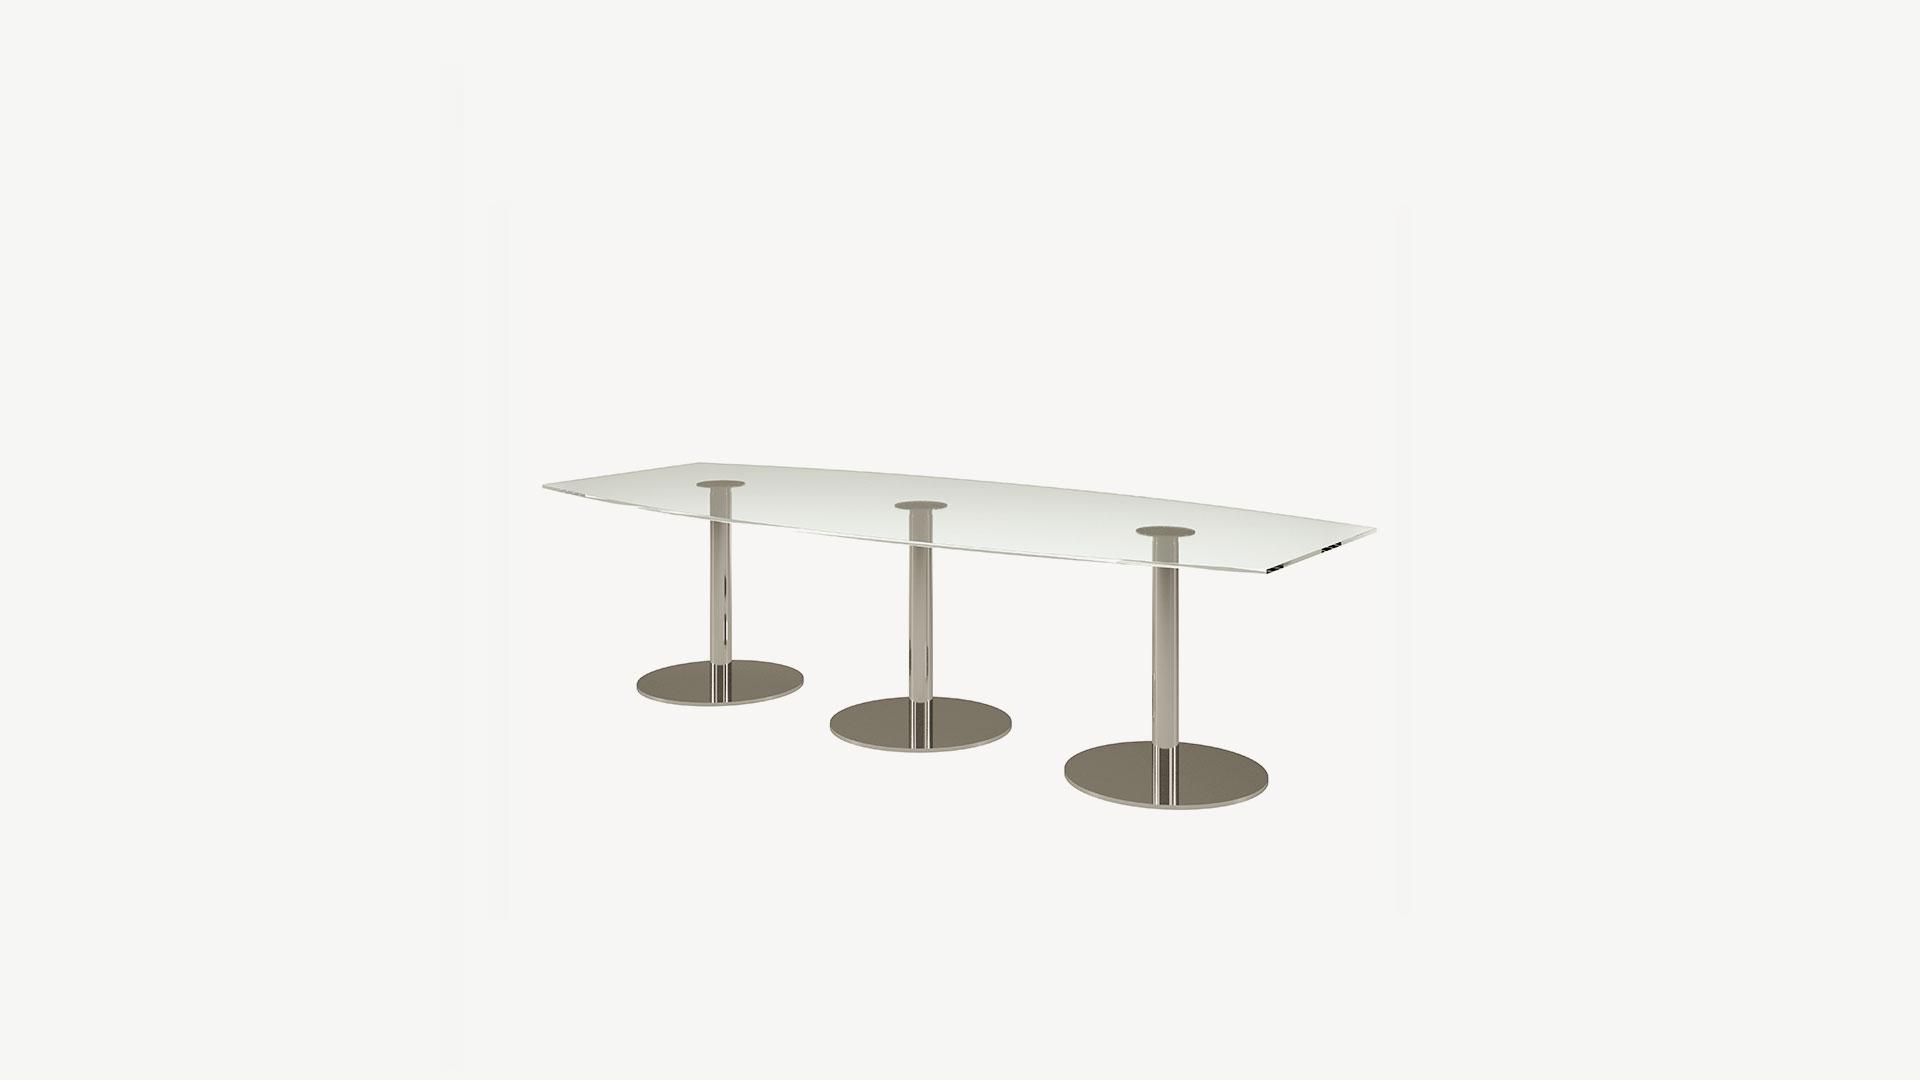 Tisch Besprechungstisch B-Desk (280 cm) - BOSSE